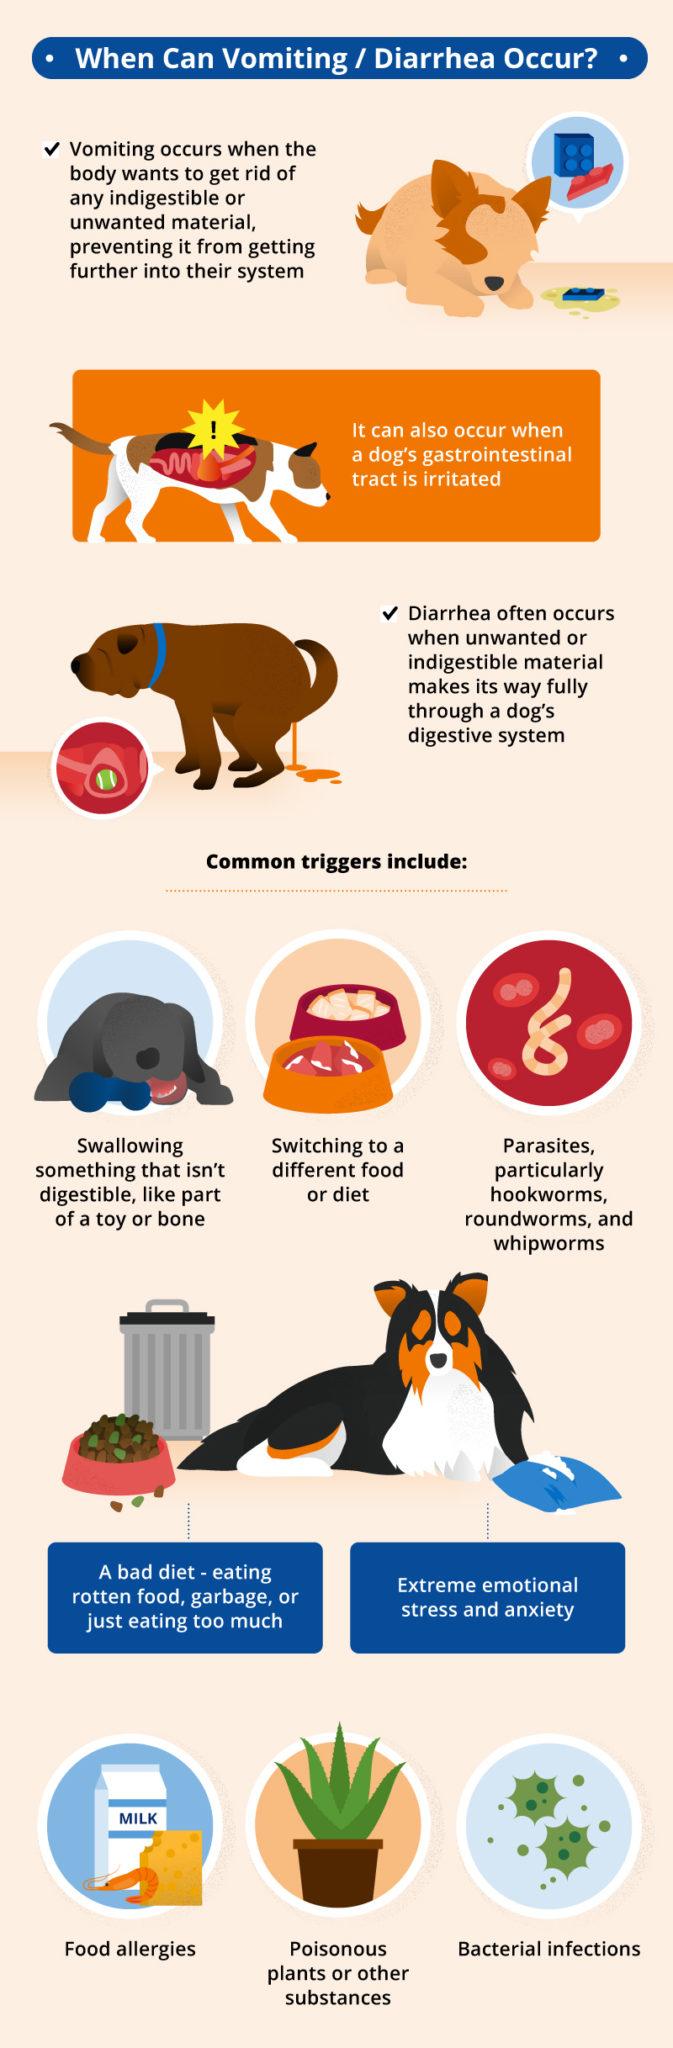 Ibs In Dogs Best Food